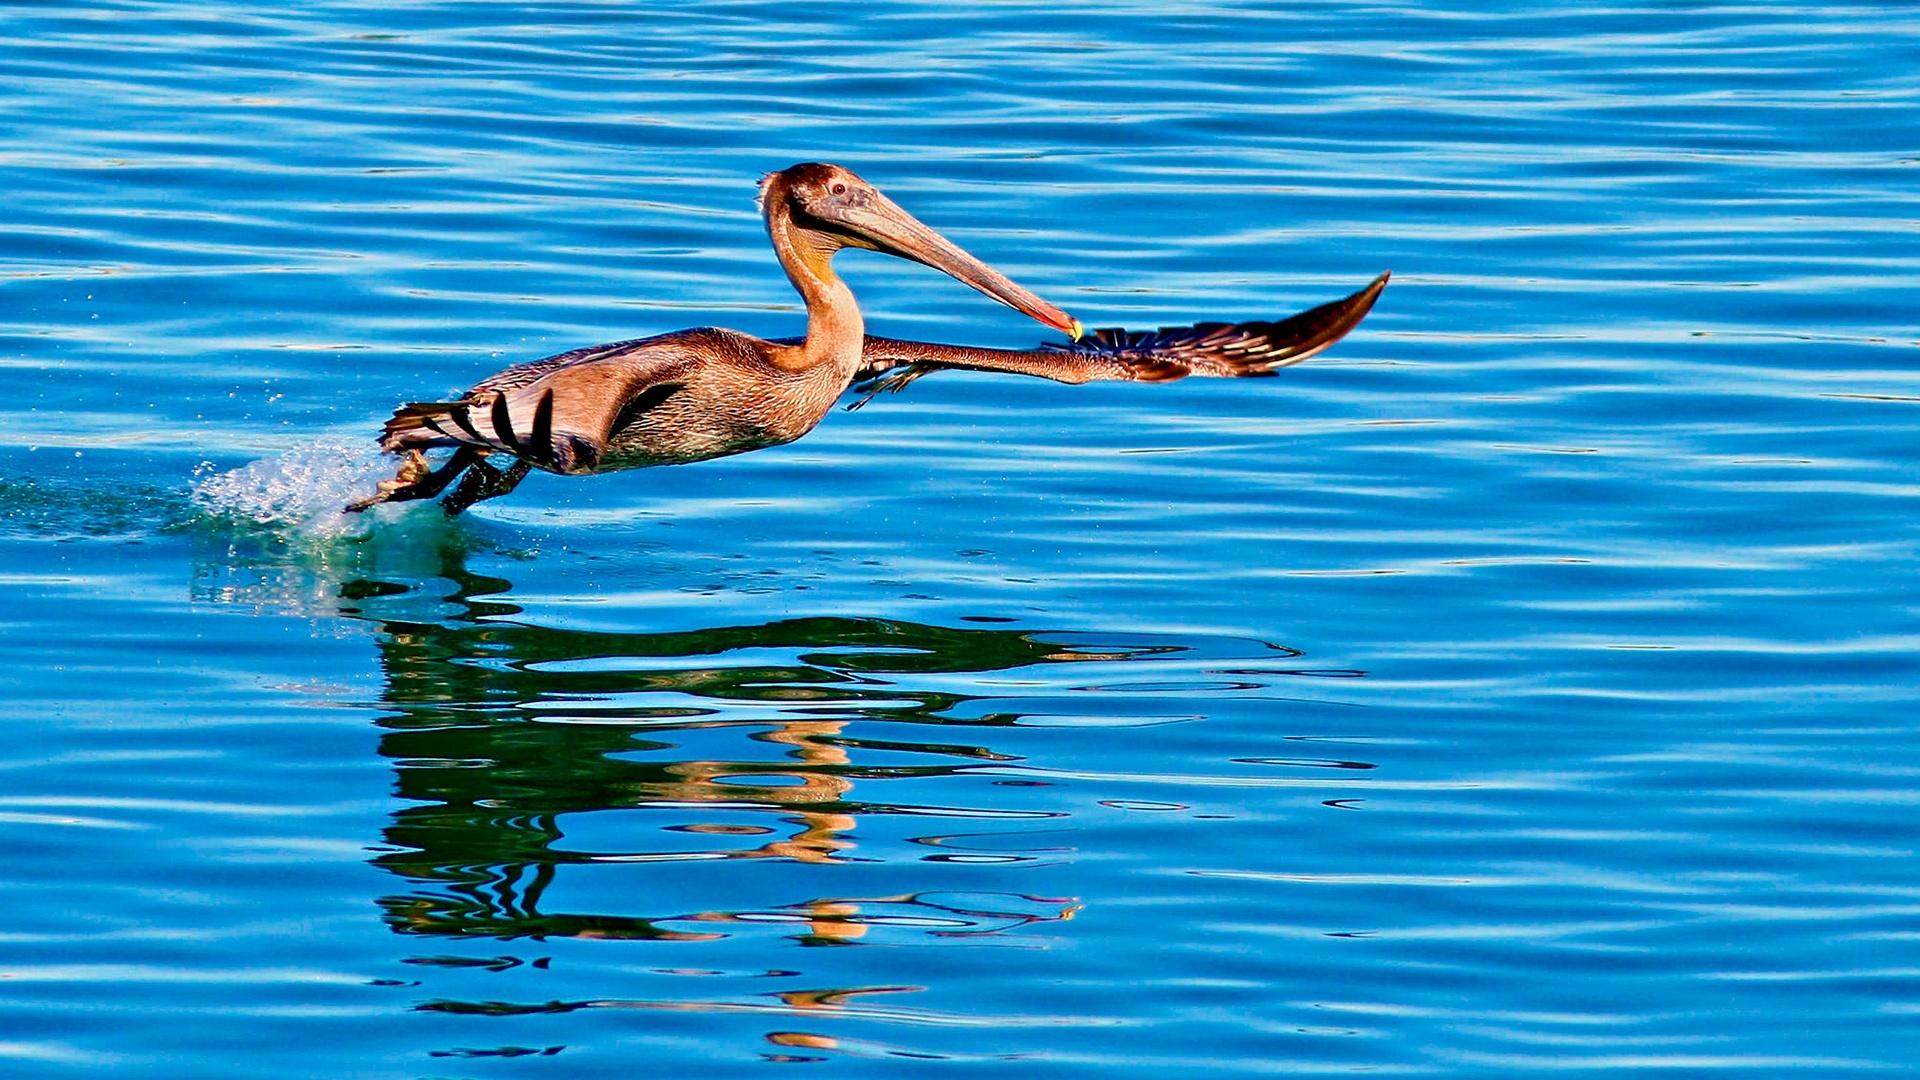 Pelican wallpaper photo hd